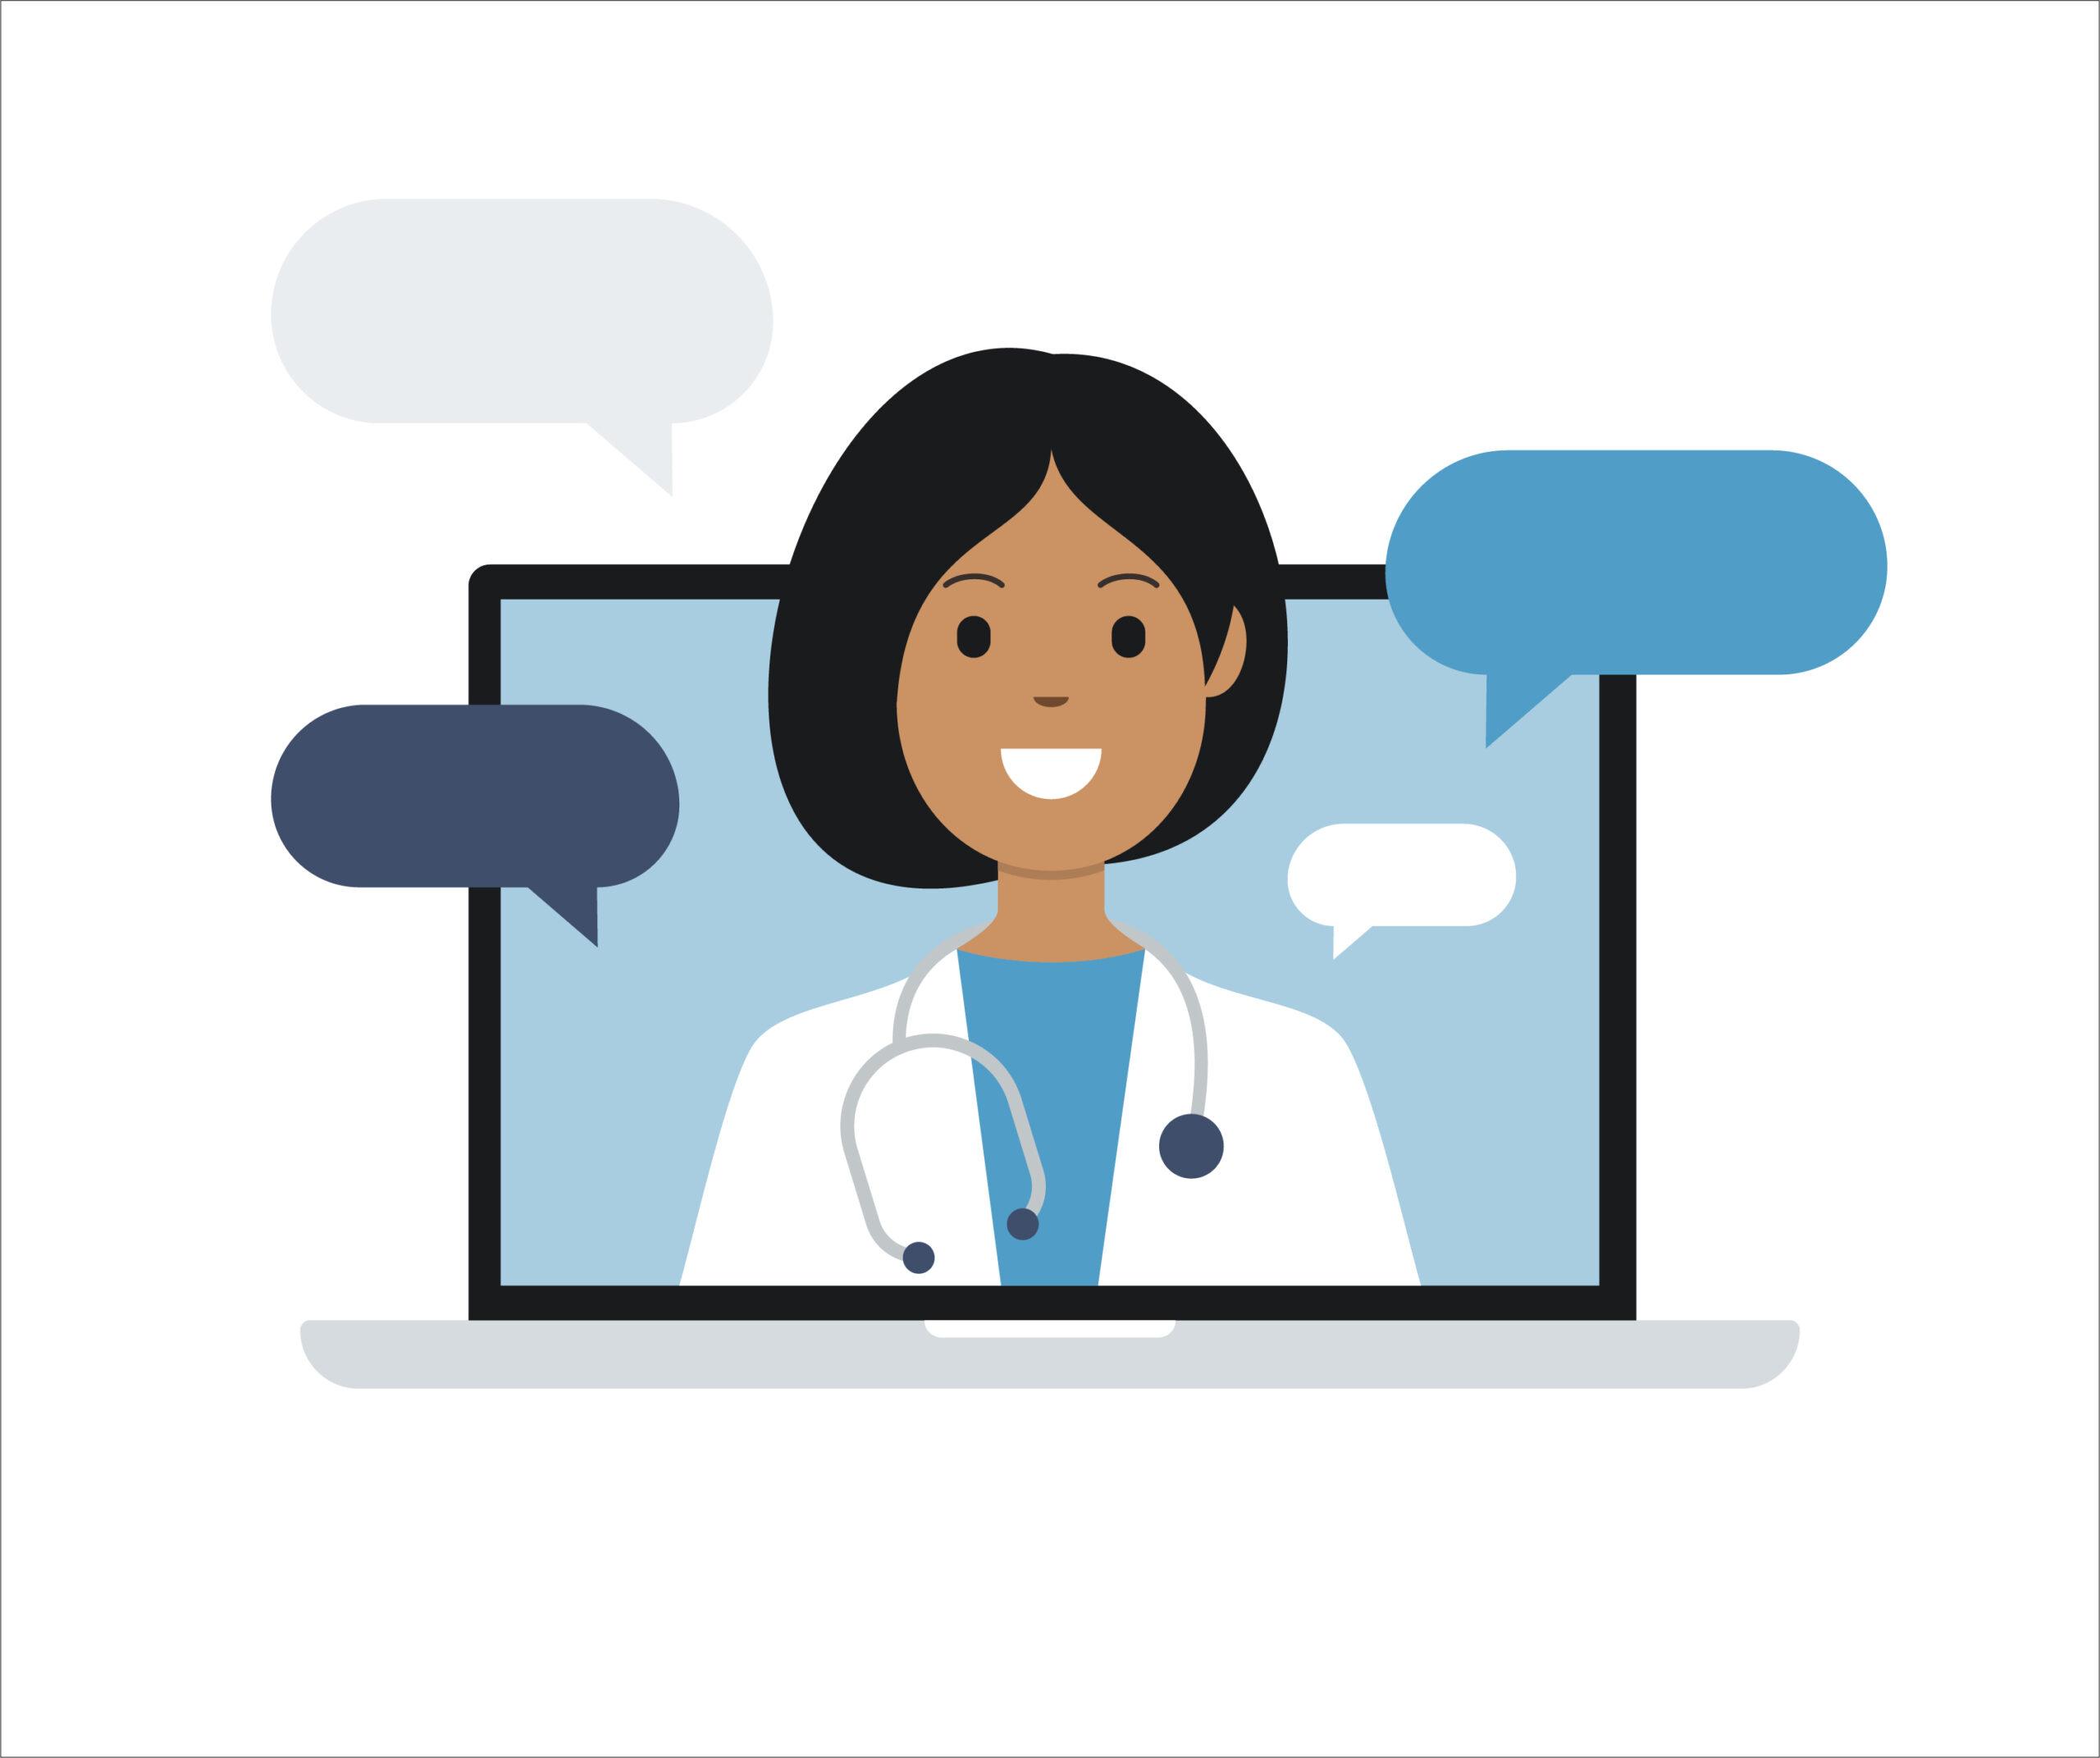 Online physician - RCM marketing ethics concept